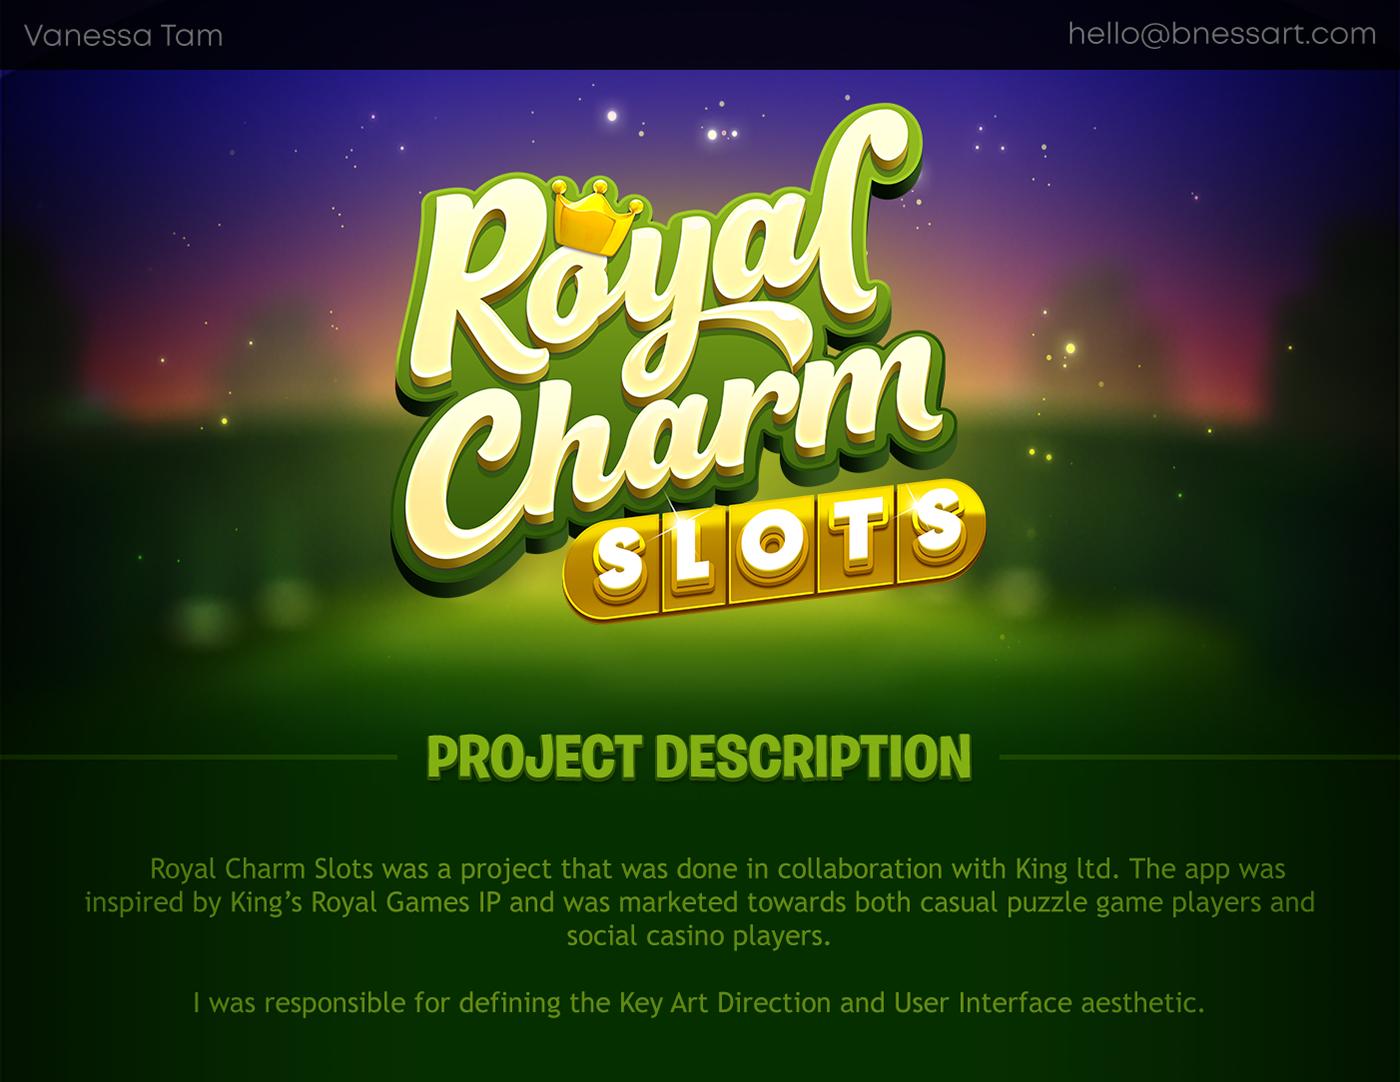 casino Charms king mobile game royal slot Slots social casino Character design  UI